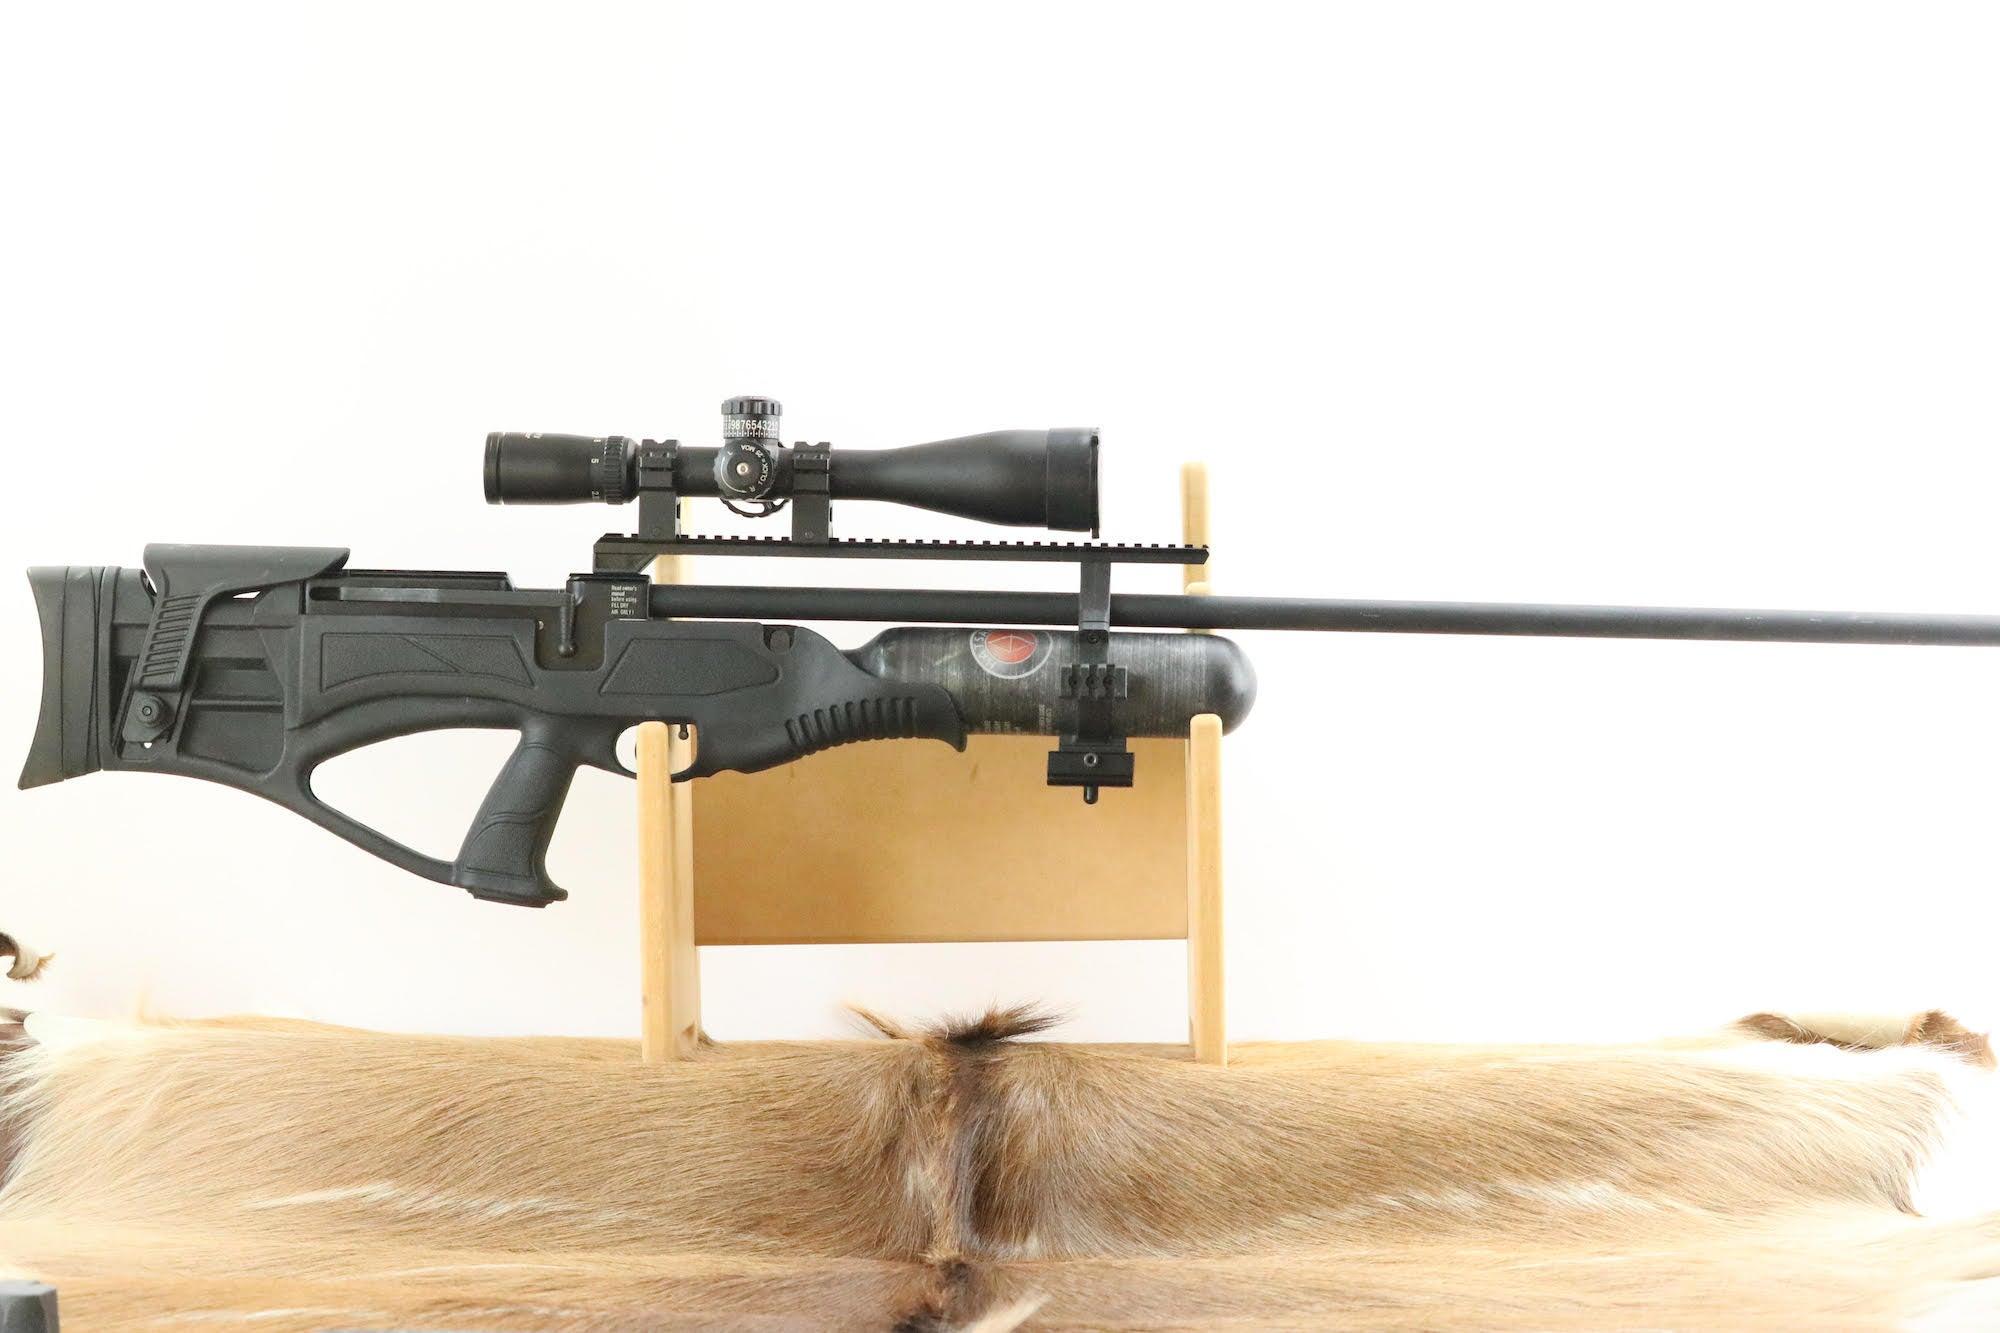 The Hartsan PileDriver air rifle